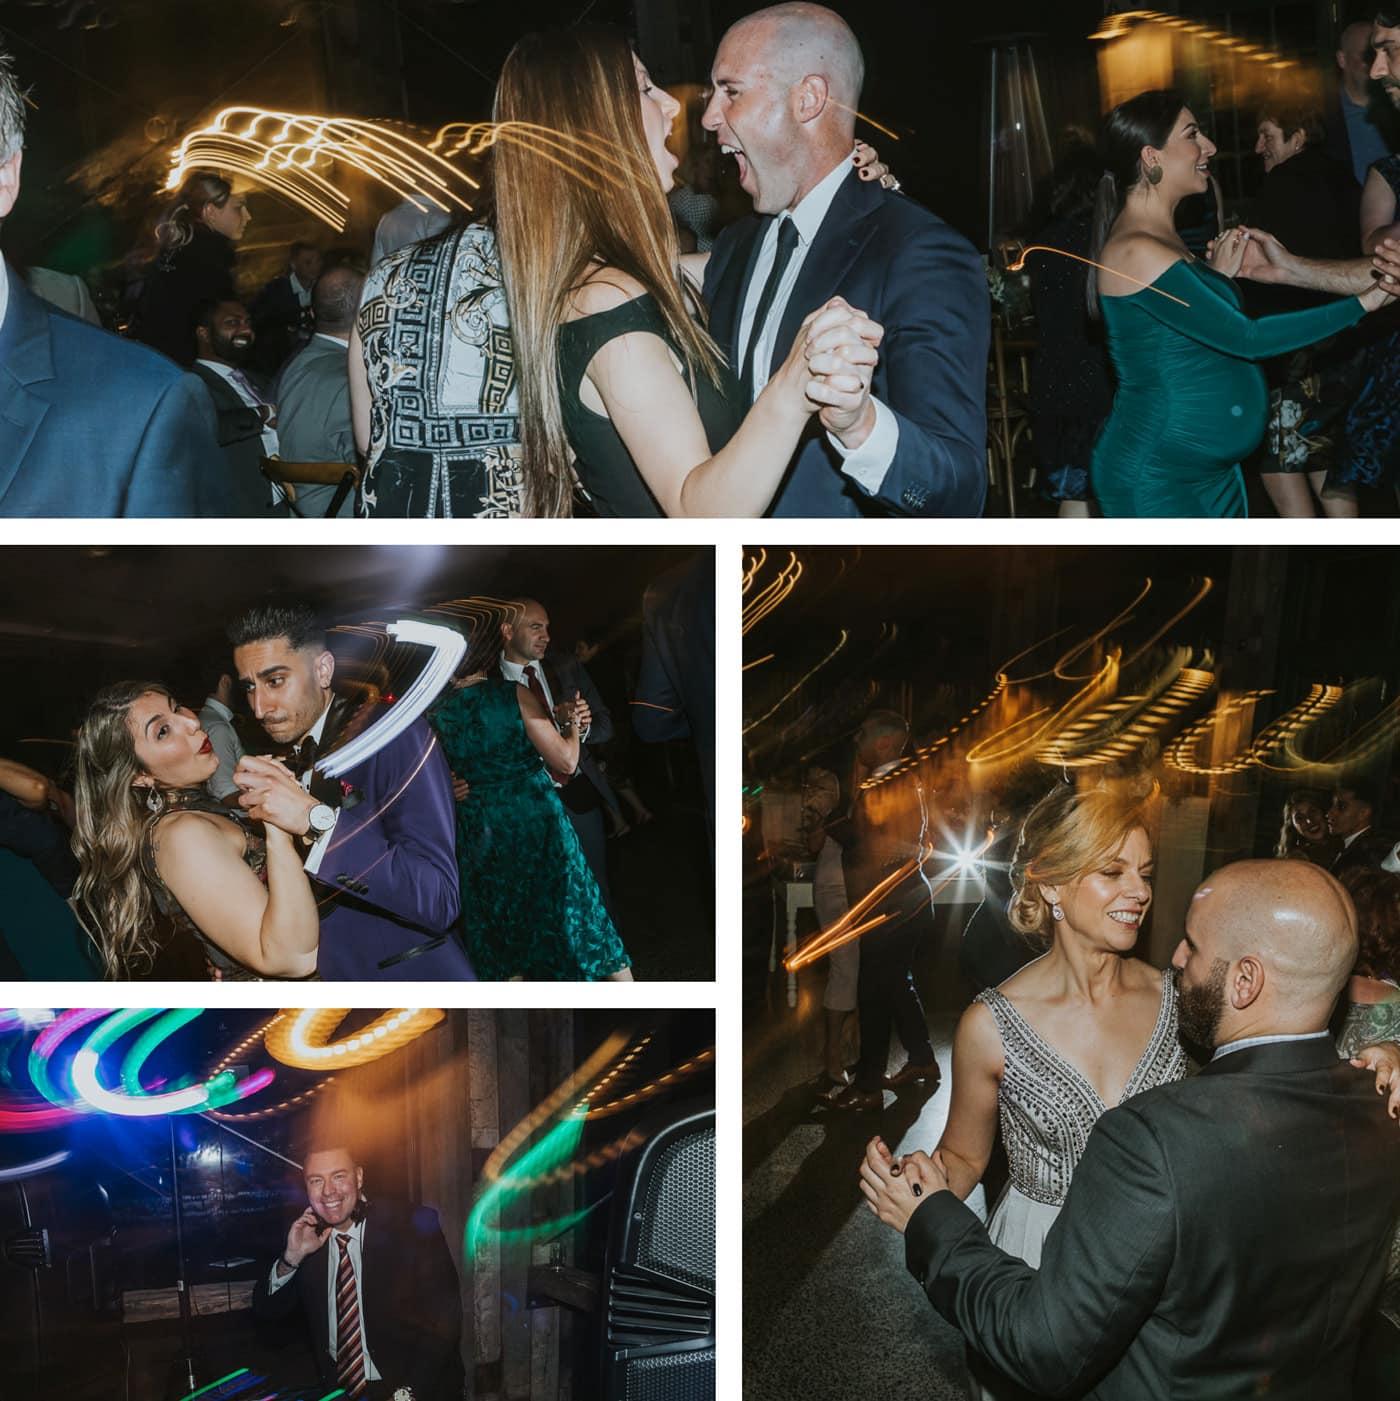 Fun dancing at wedding party